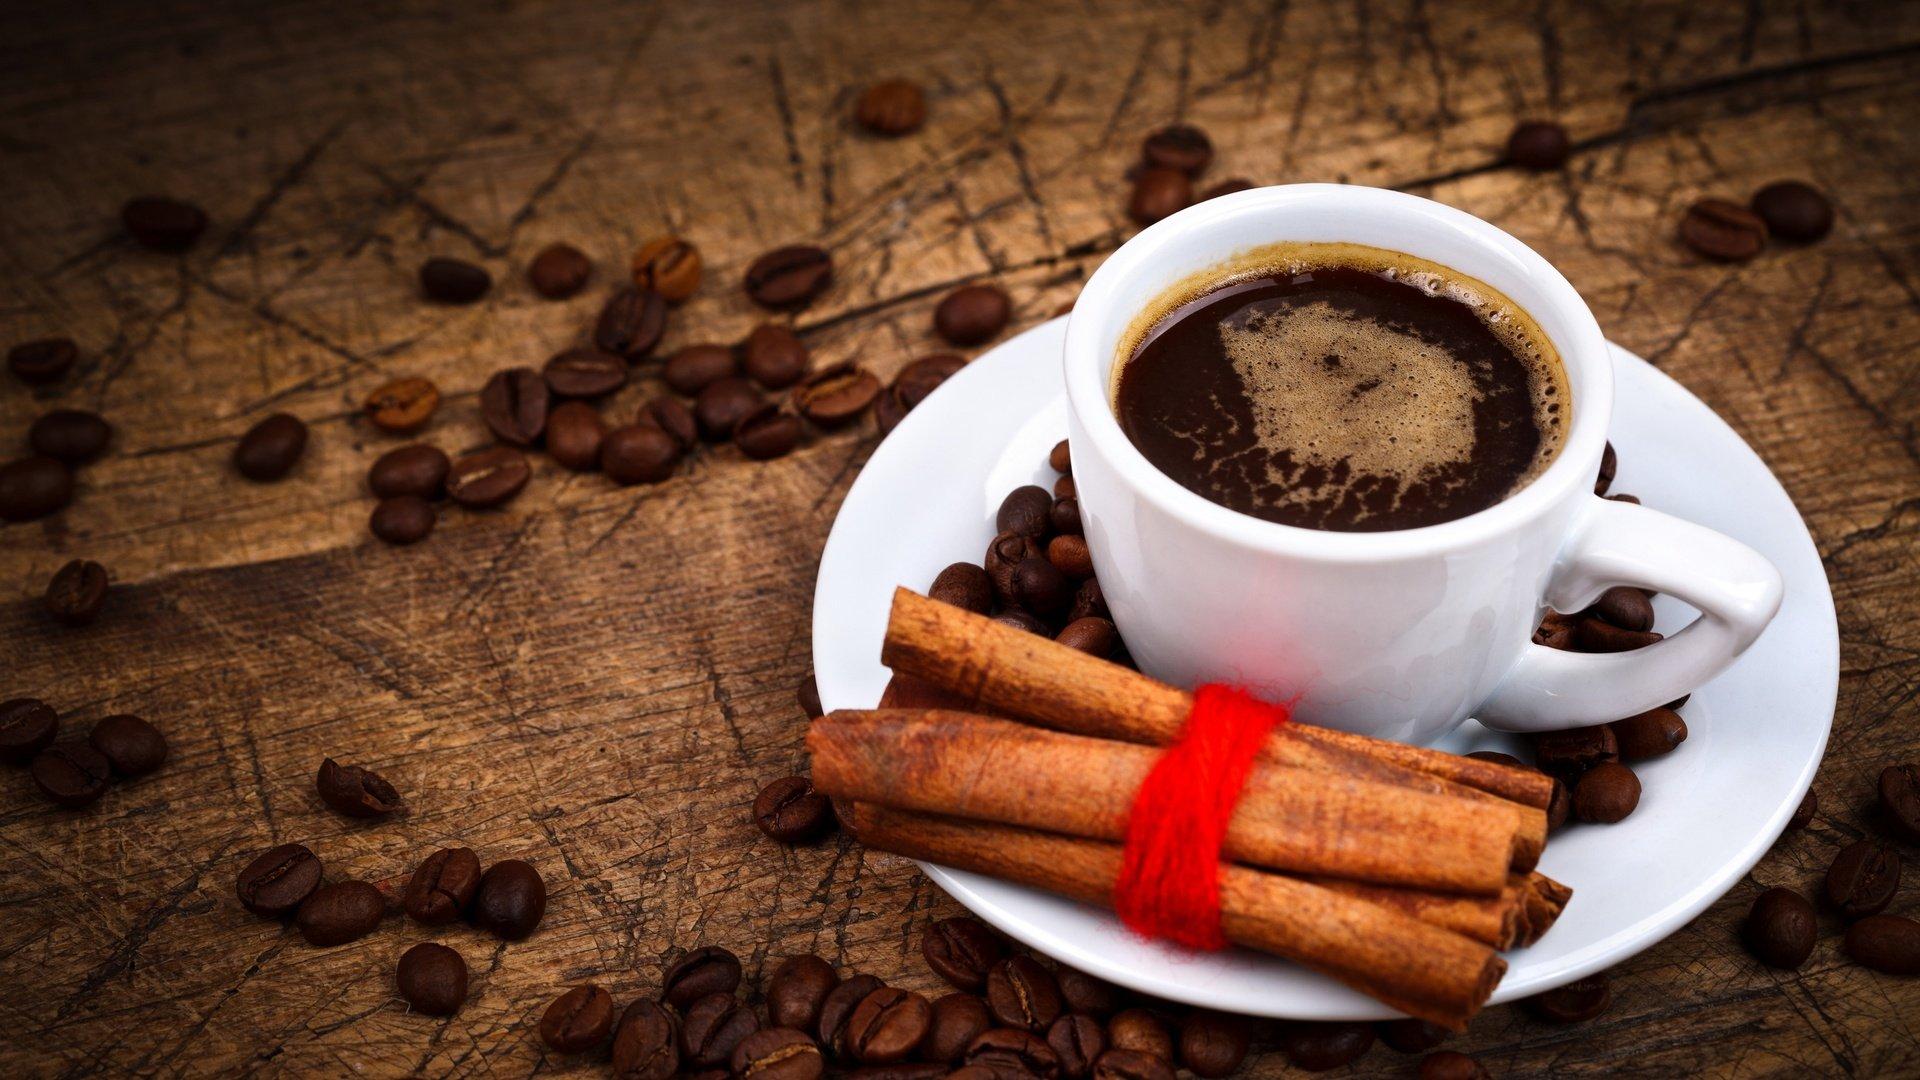 корица кофе чашка cinnamon coffee Cup  № 1119836 загрузить